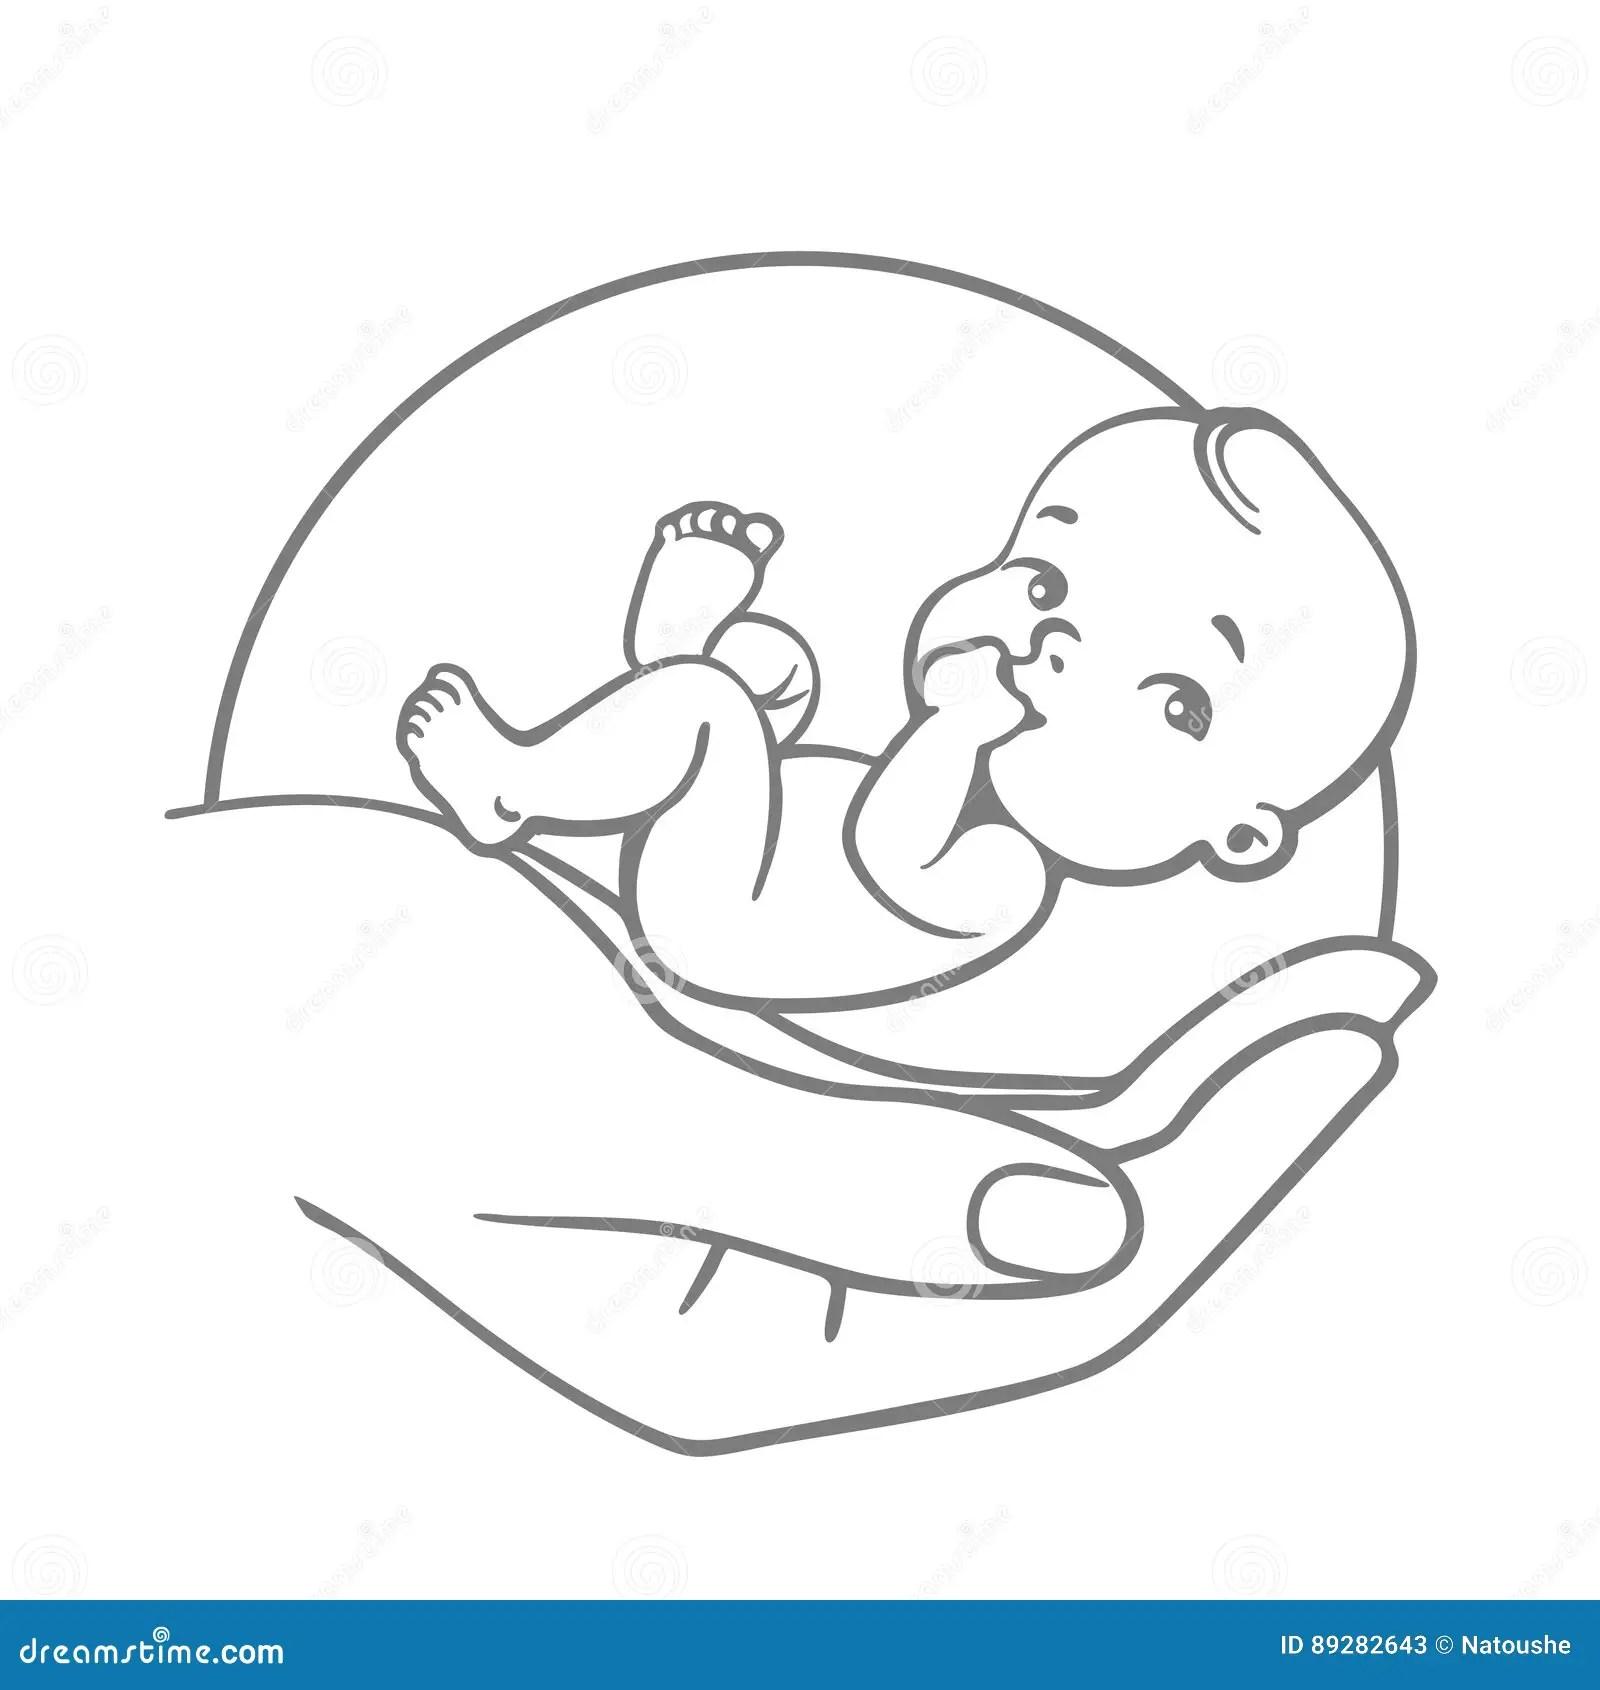 Baby care logo stock vector. Illustration of child, logo